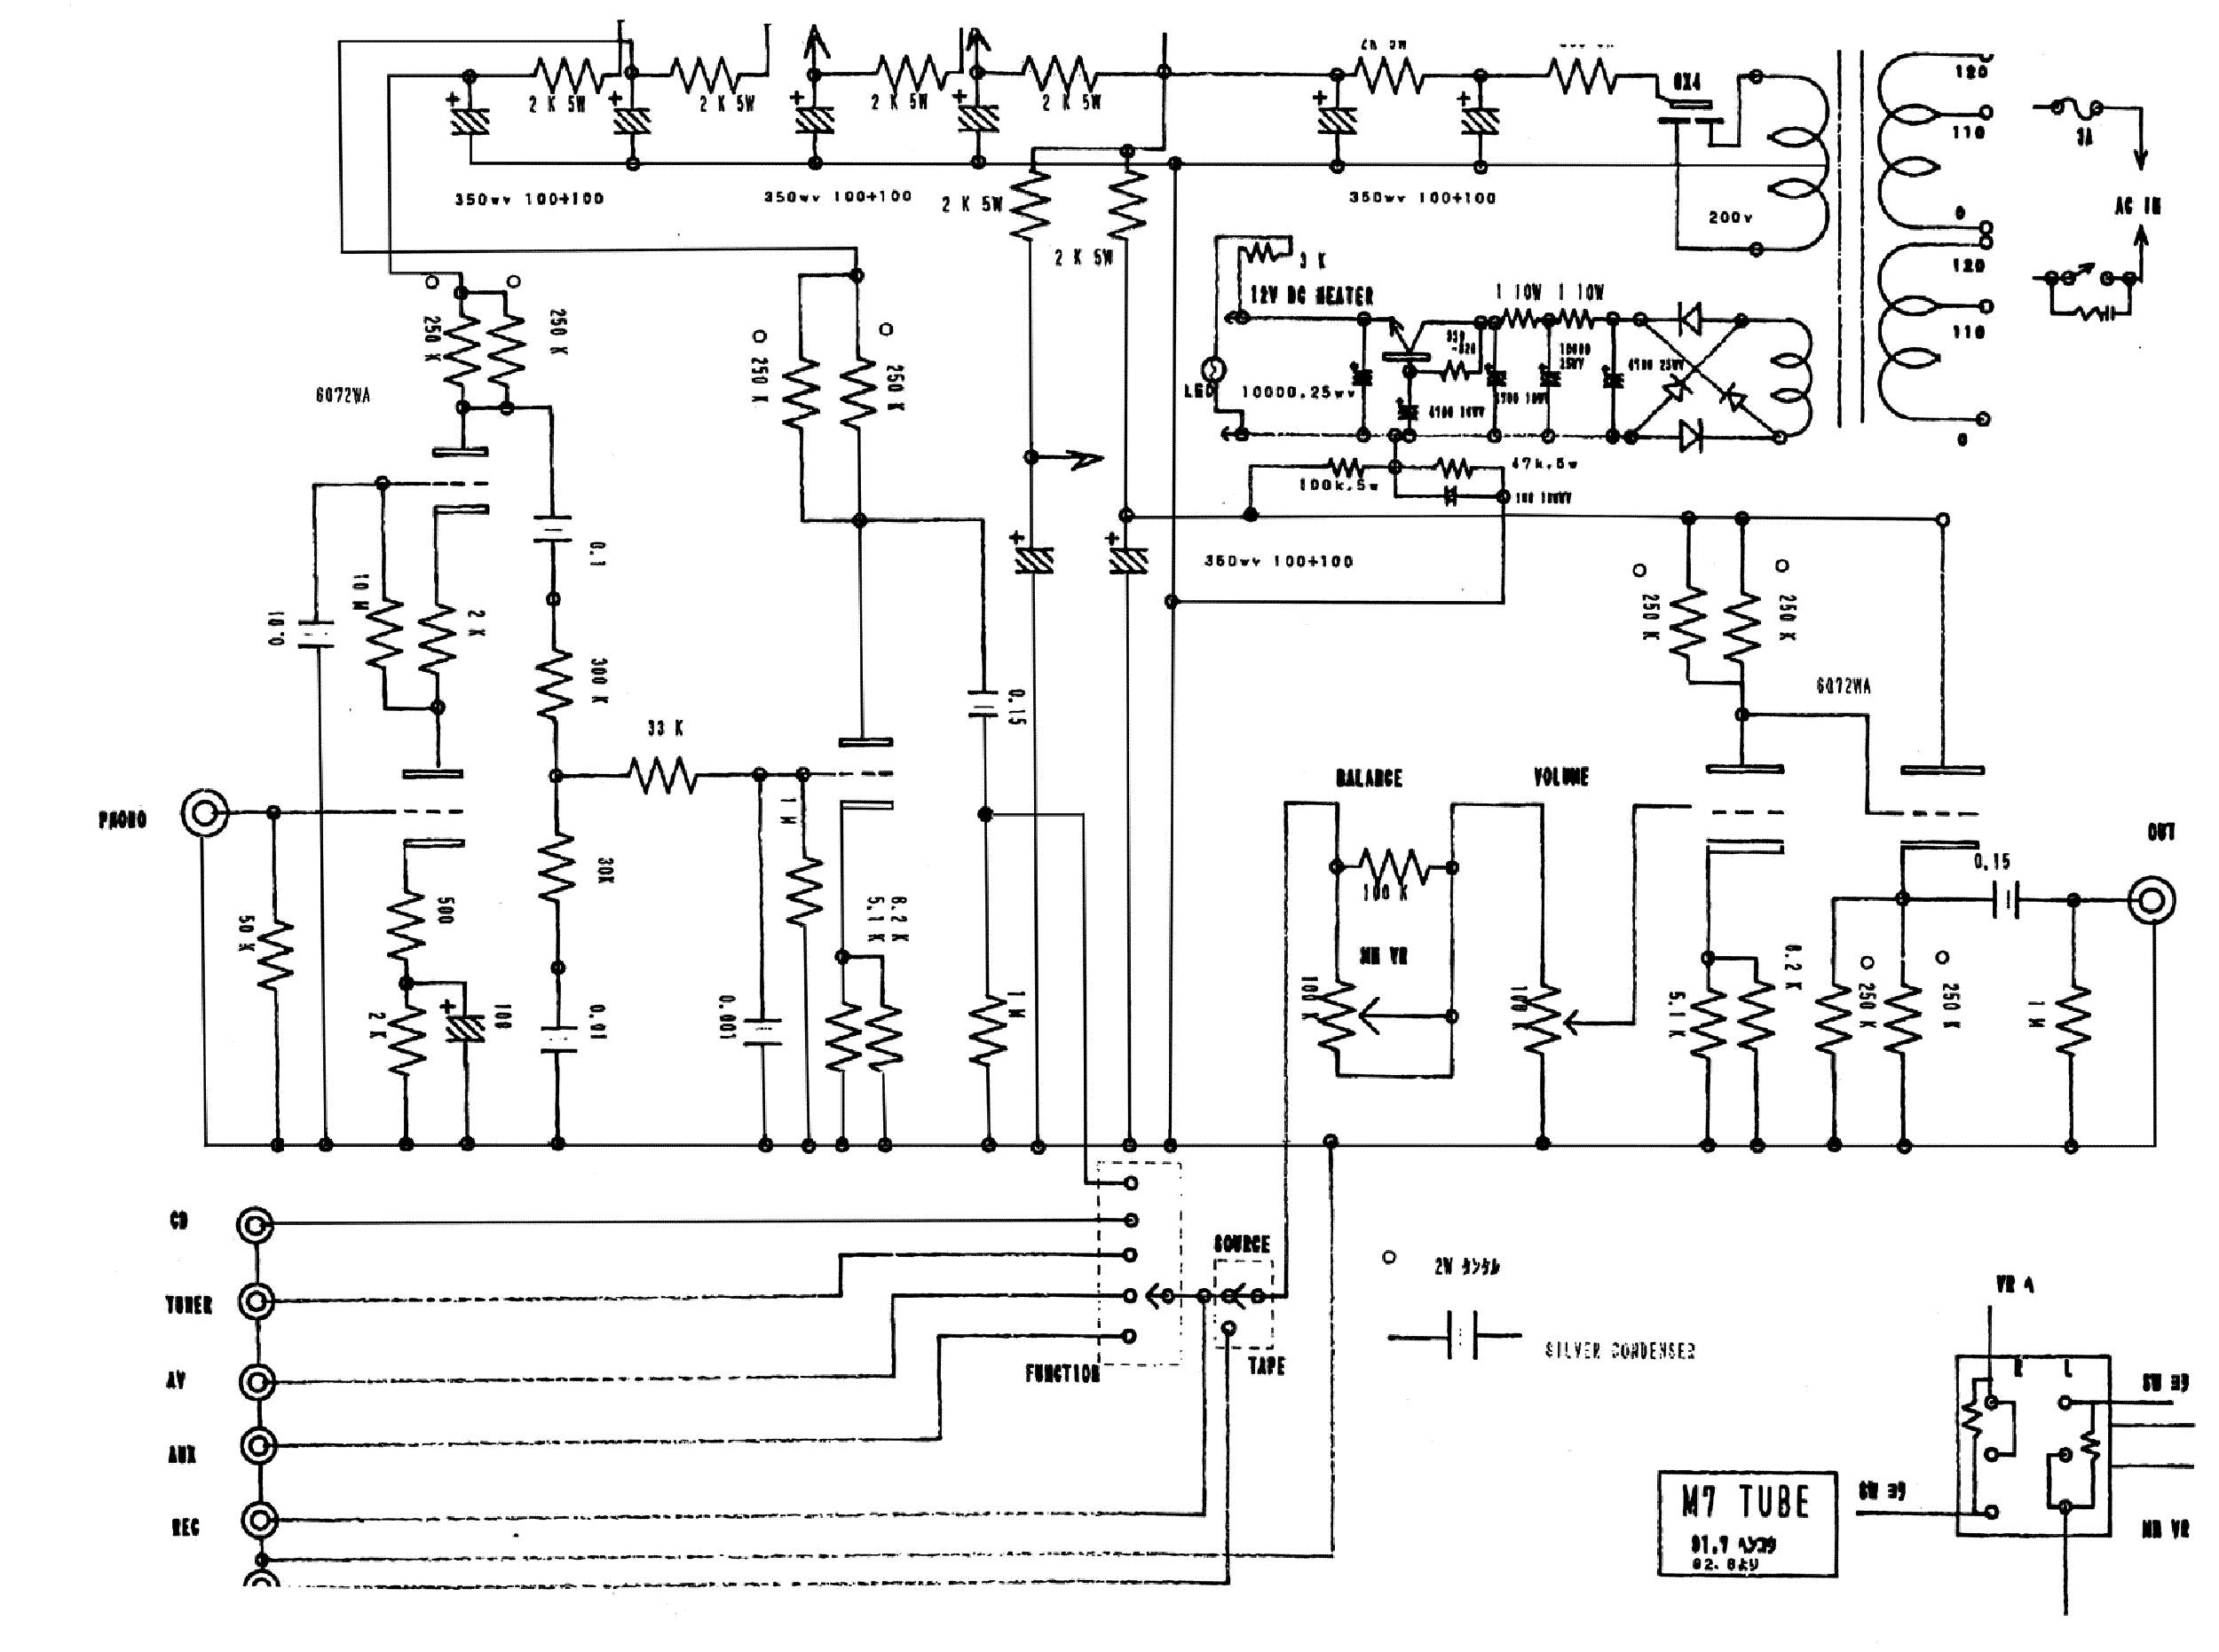 jl audio 500 1 manual pdf